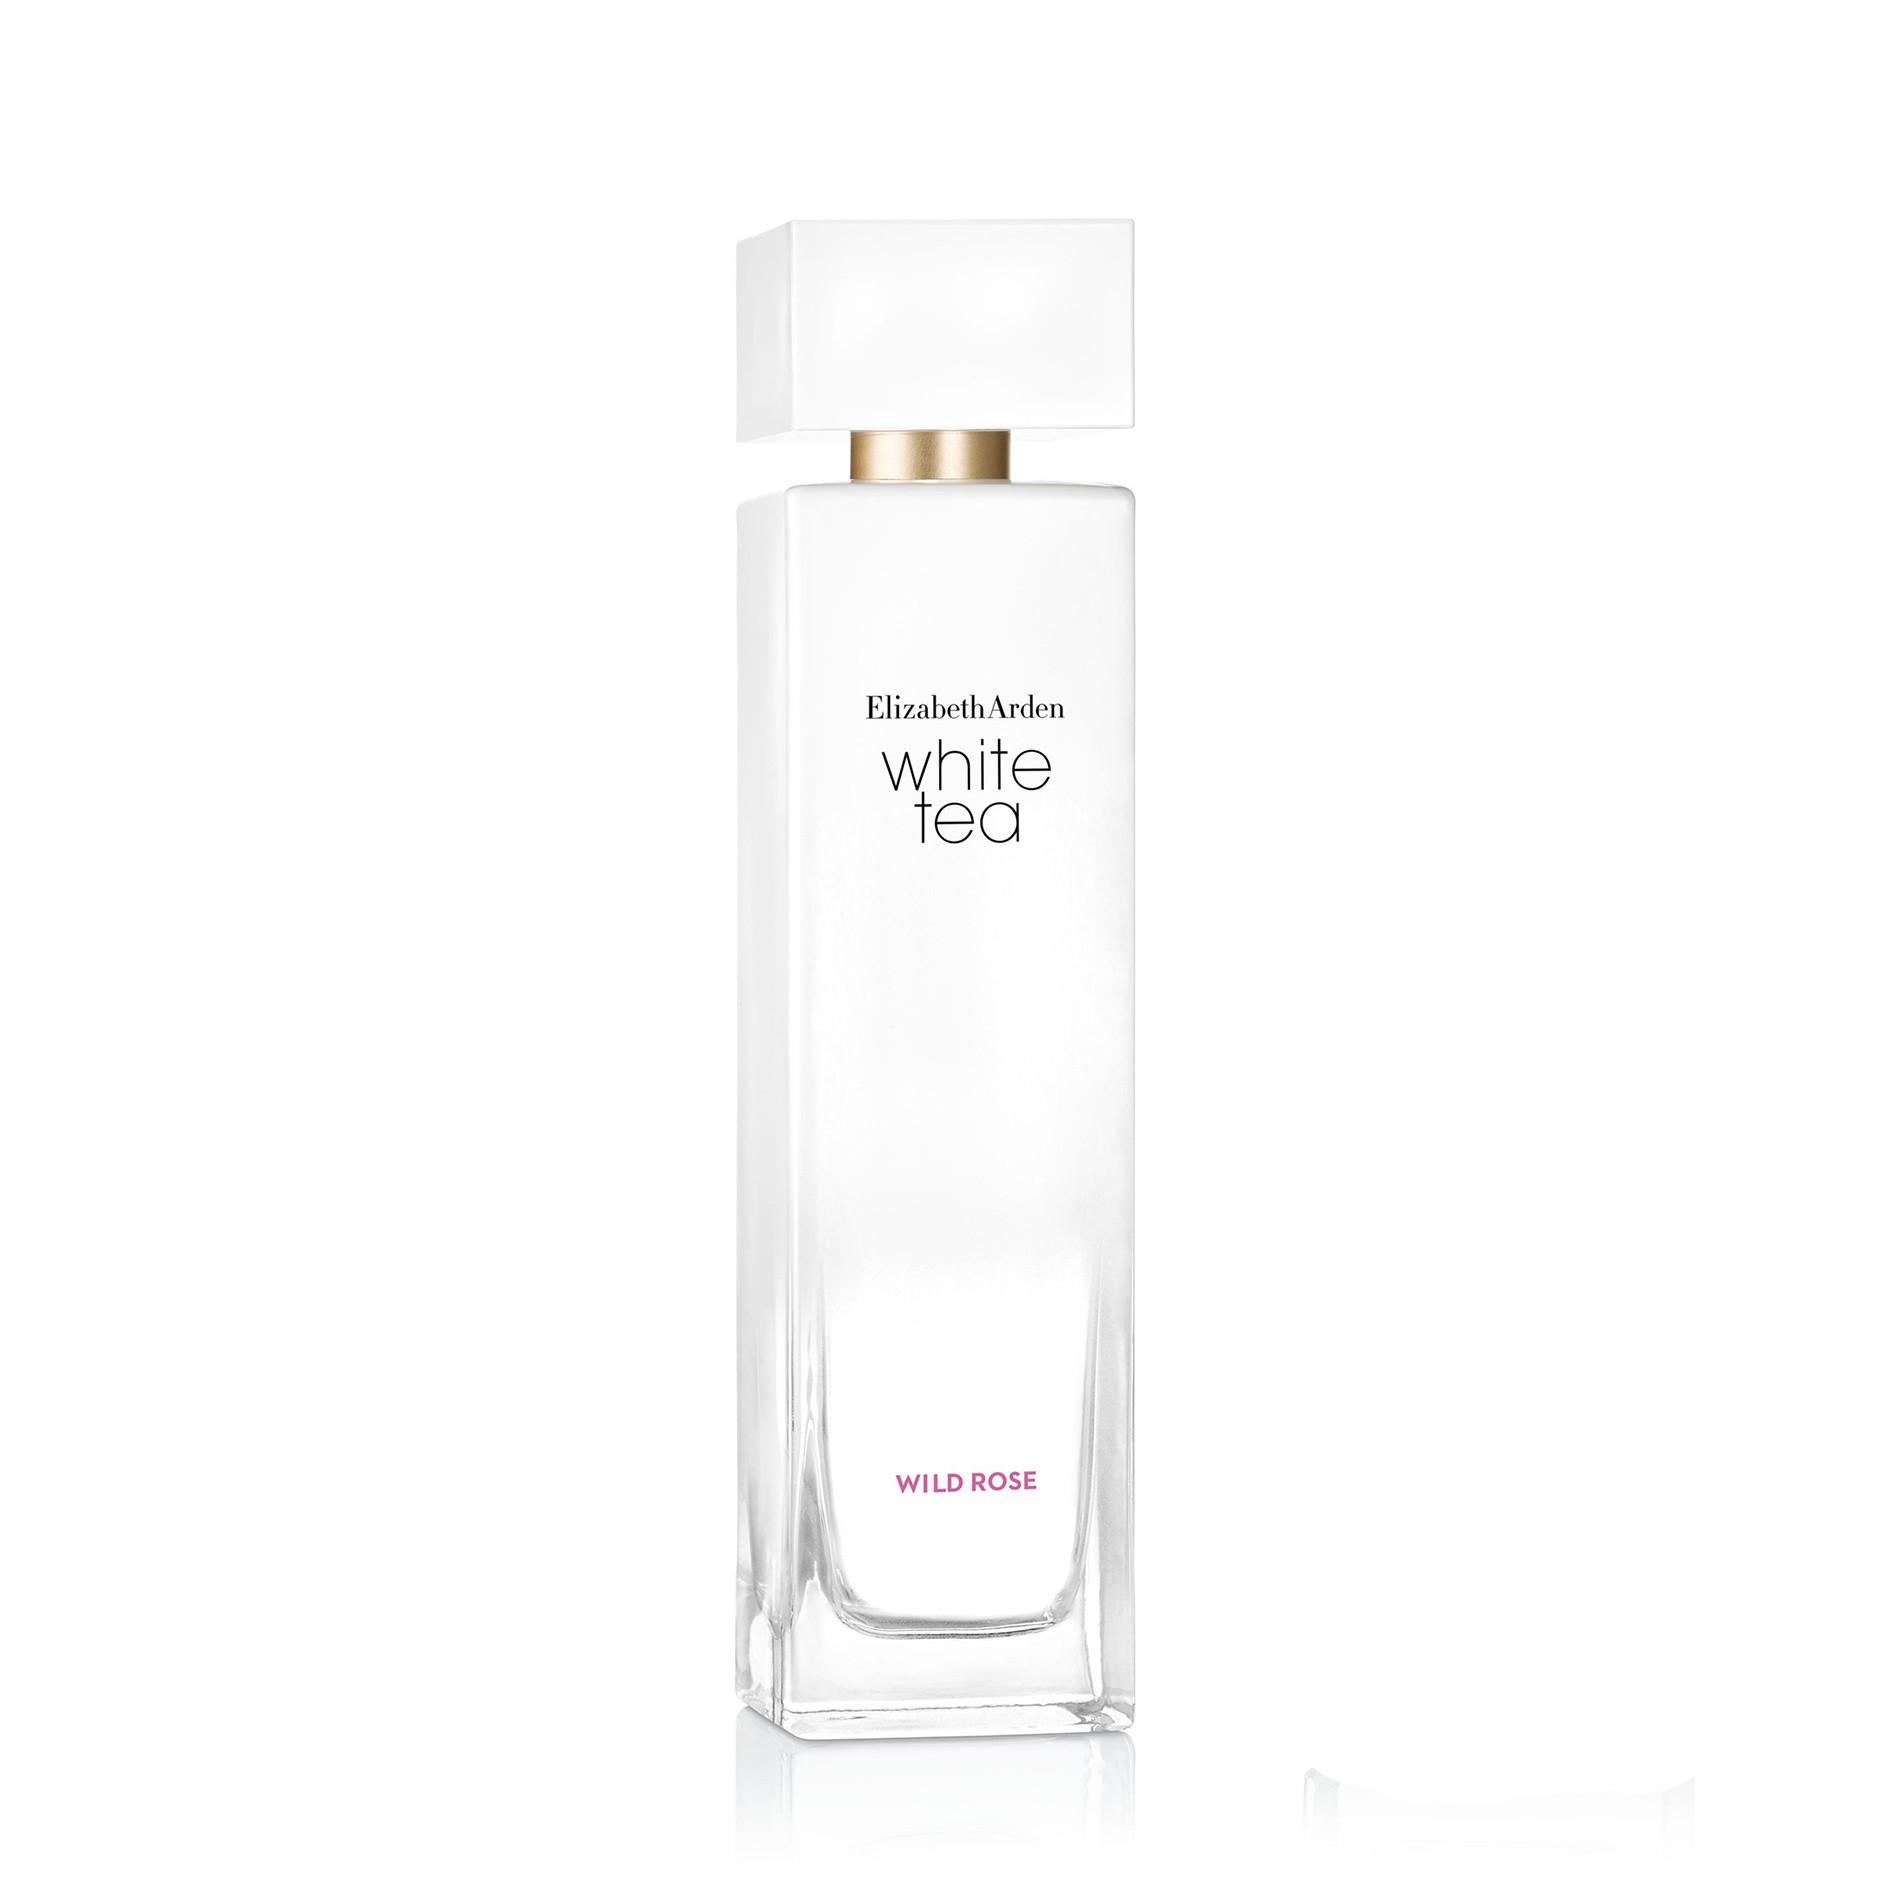 White Tea Wild Rose Eau De Toilette Spray 100 ml, Bianco, large image number 0